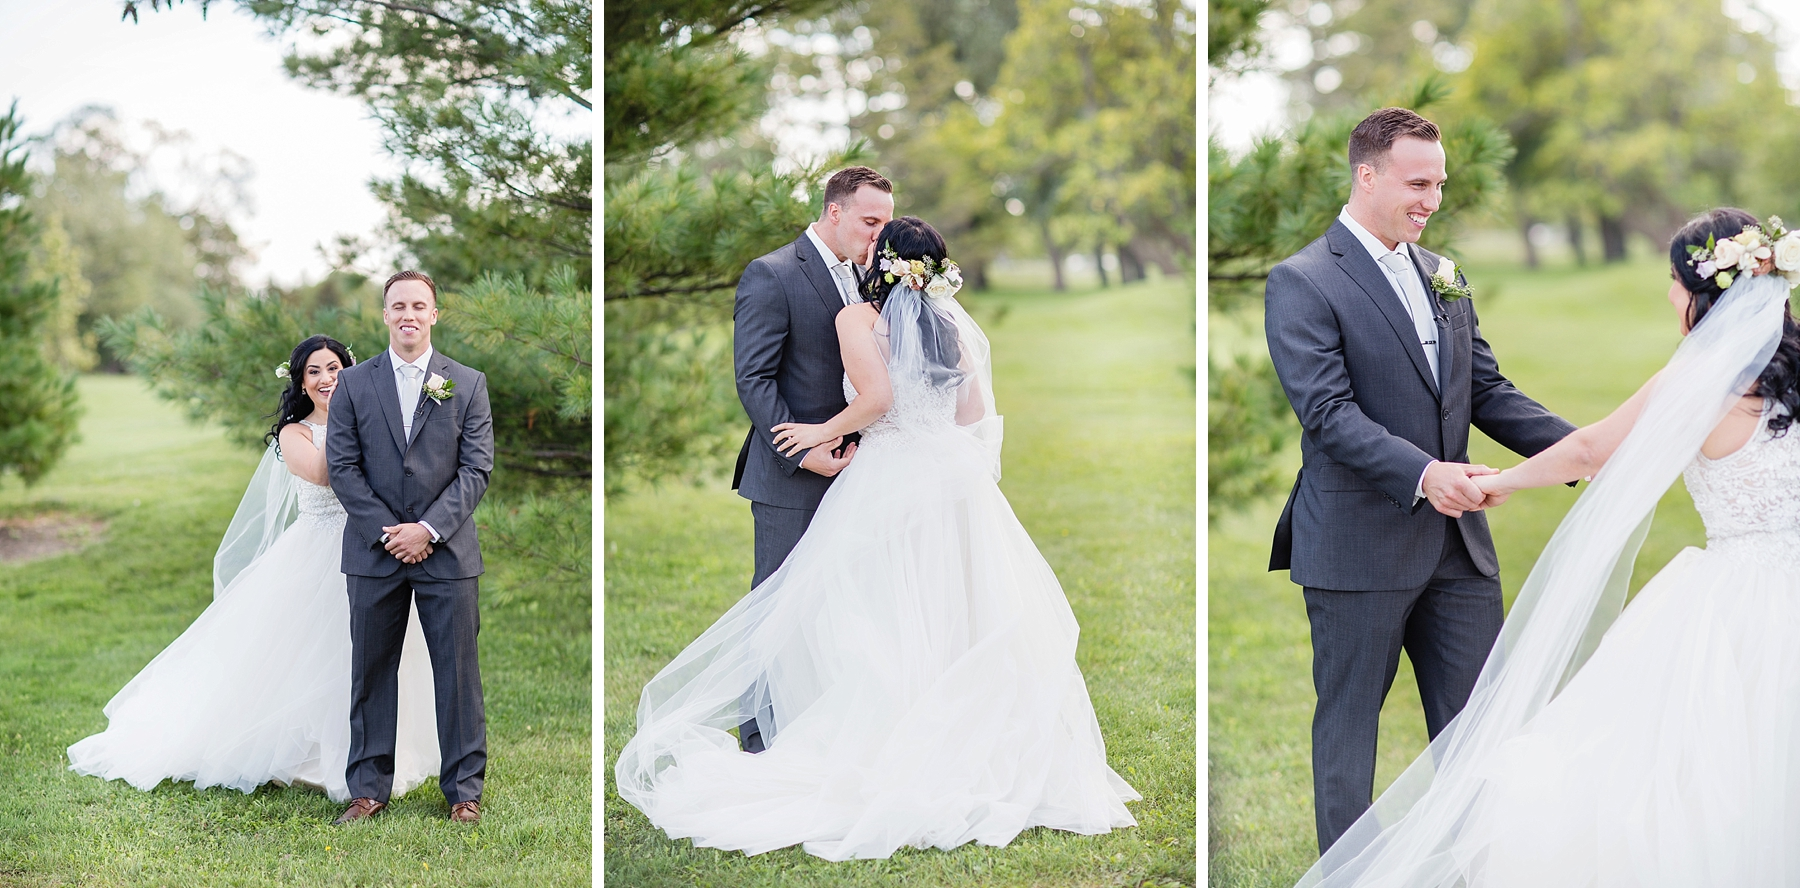 windsor-wedding-photographer-sprucewood-shores-winery-wedding-niagara-on-the-lake-wedding-photographer-eryn-shea-photography_0023.jpg